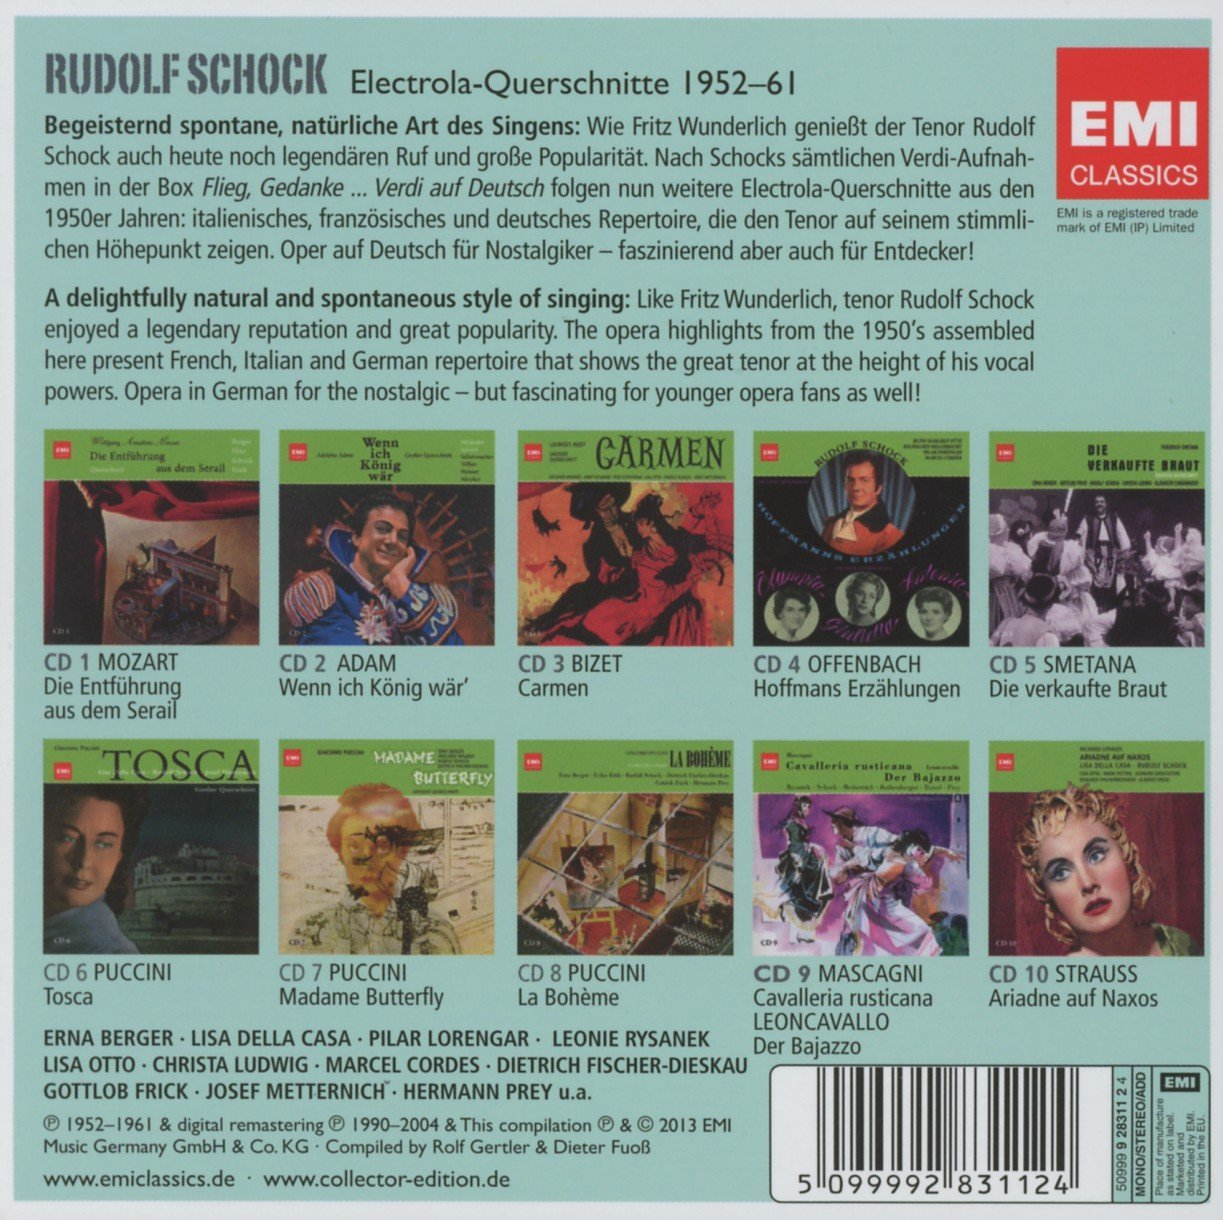 Rudolf Schock on EMI new release 10 CD box-set